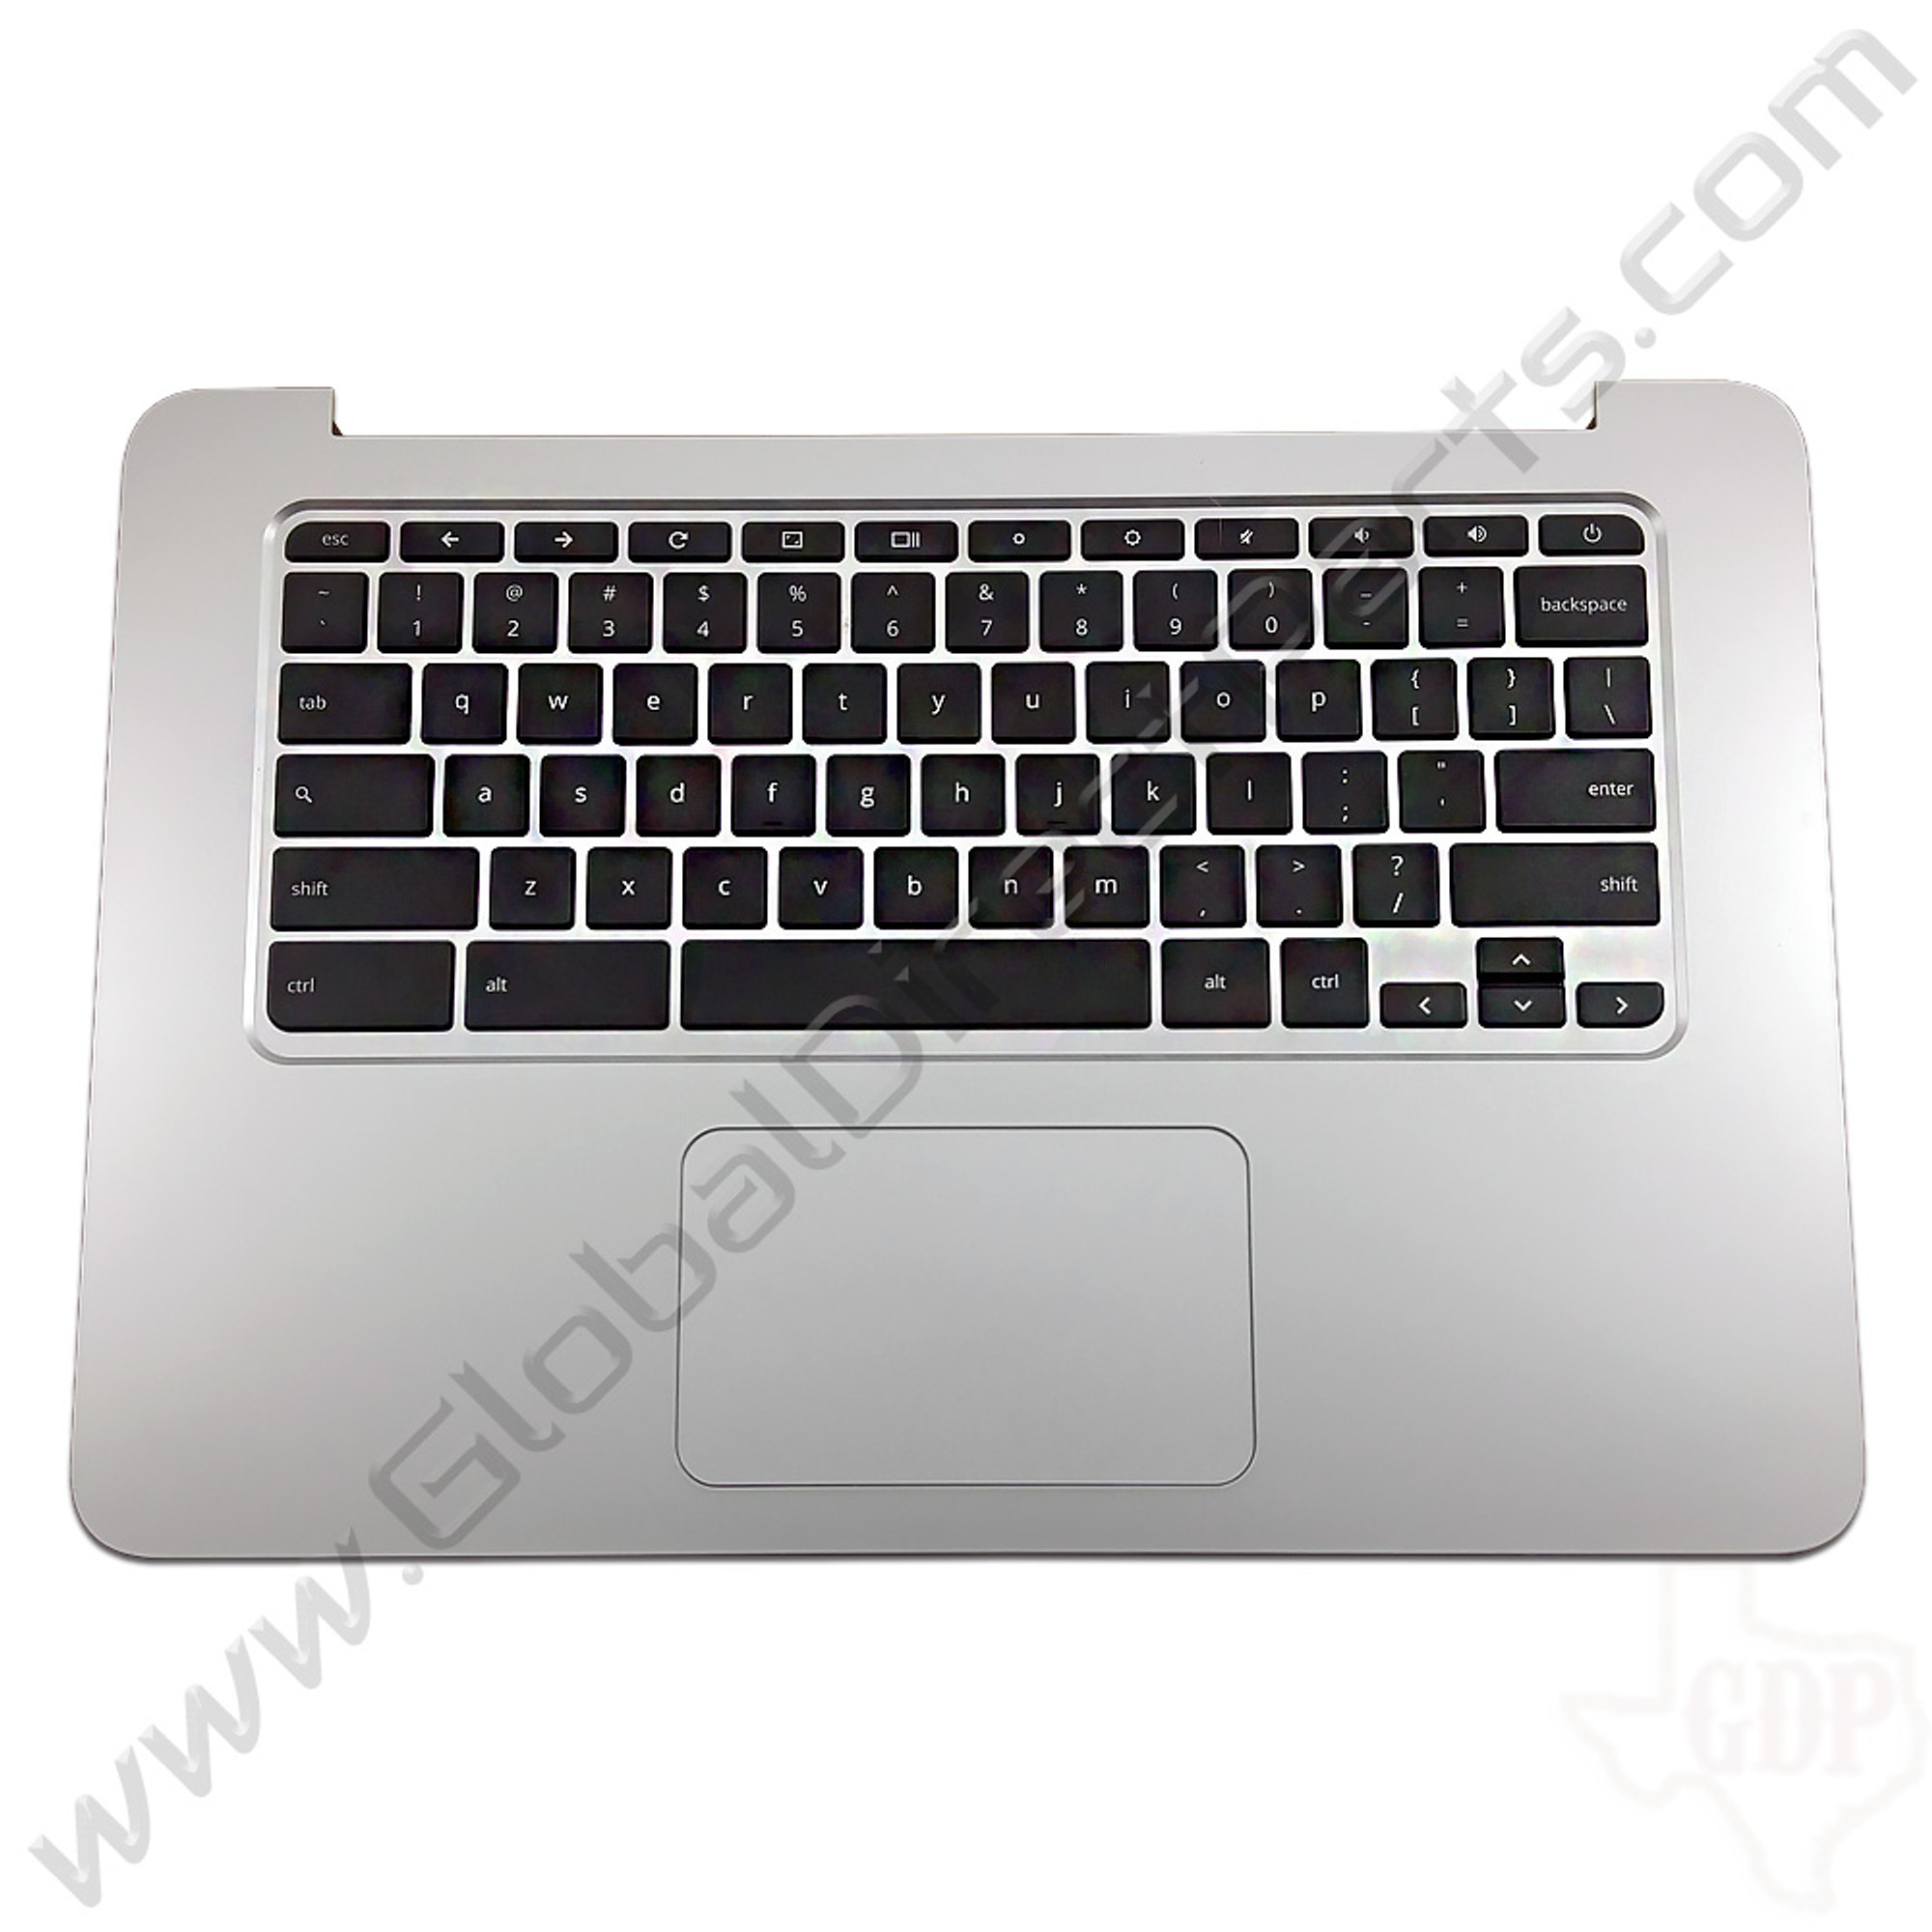 250 G4 Notebook PC Palmrest Touchpad Assembly w//Keyboard Black 813974171 813974-171 by EbidDealz